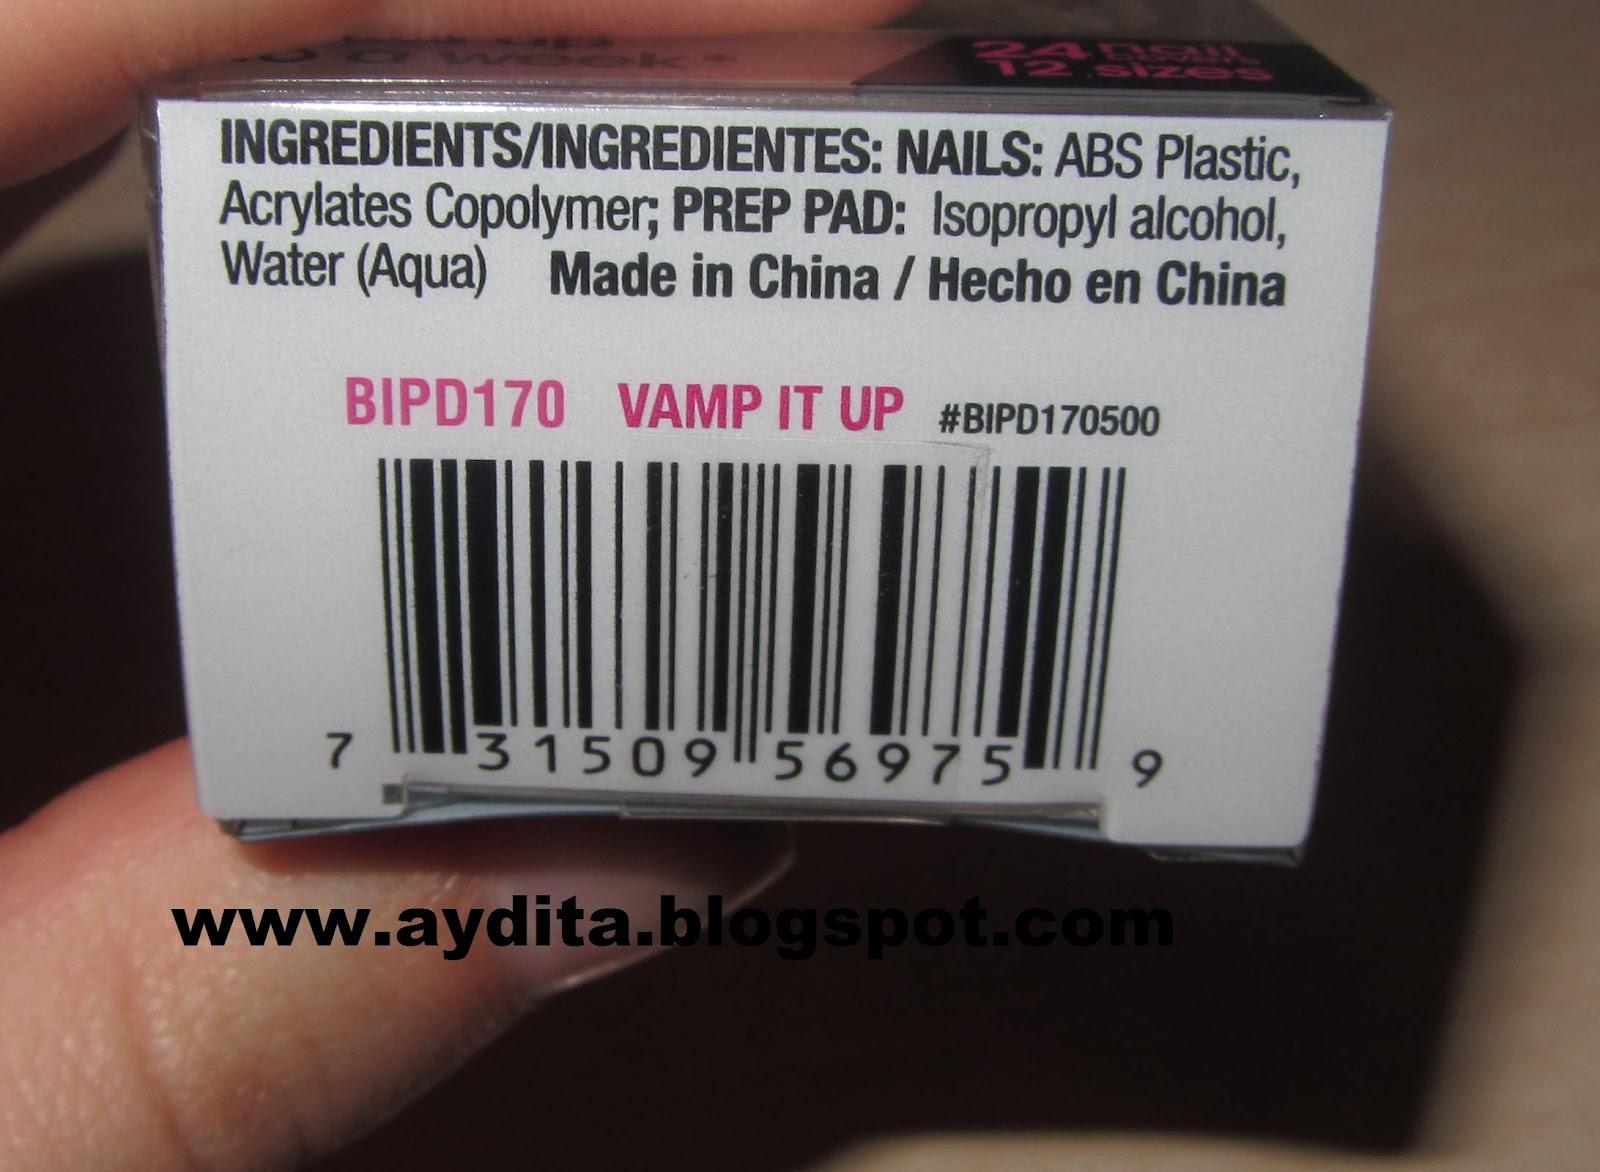 40ee03aa6f La caja sorpresa del maquillaje  Manicura ImPress Vamp it up.